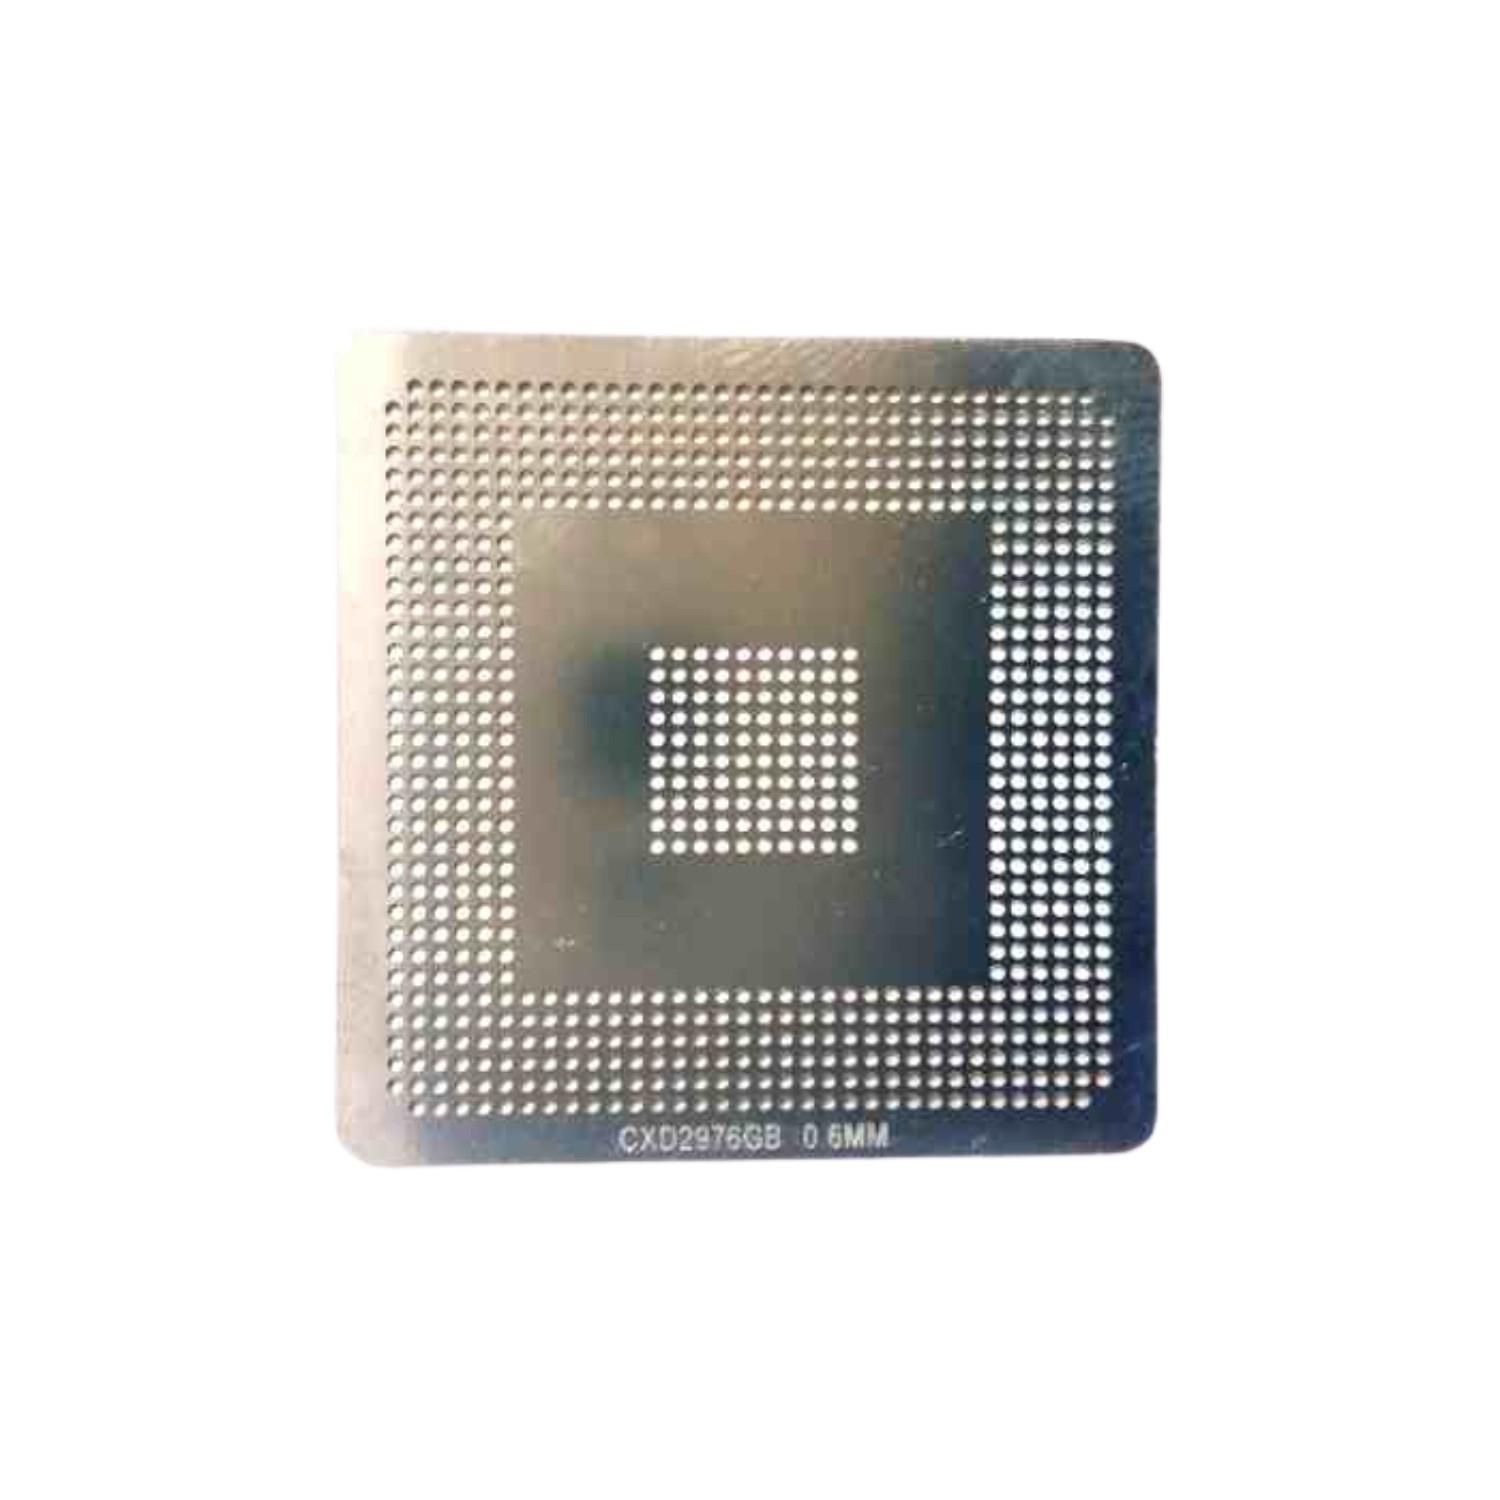 Stencil CXD2976GB 0,6mm Calor Direto Bga Reballing - GM3